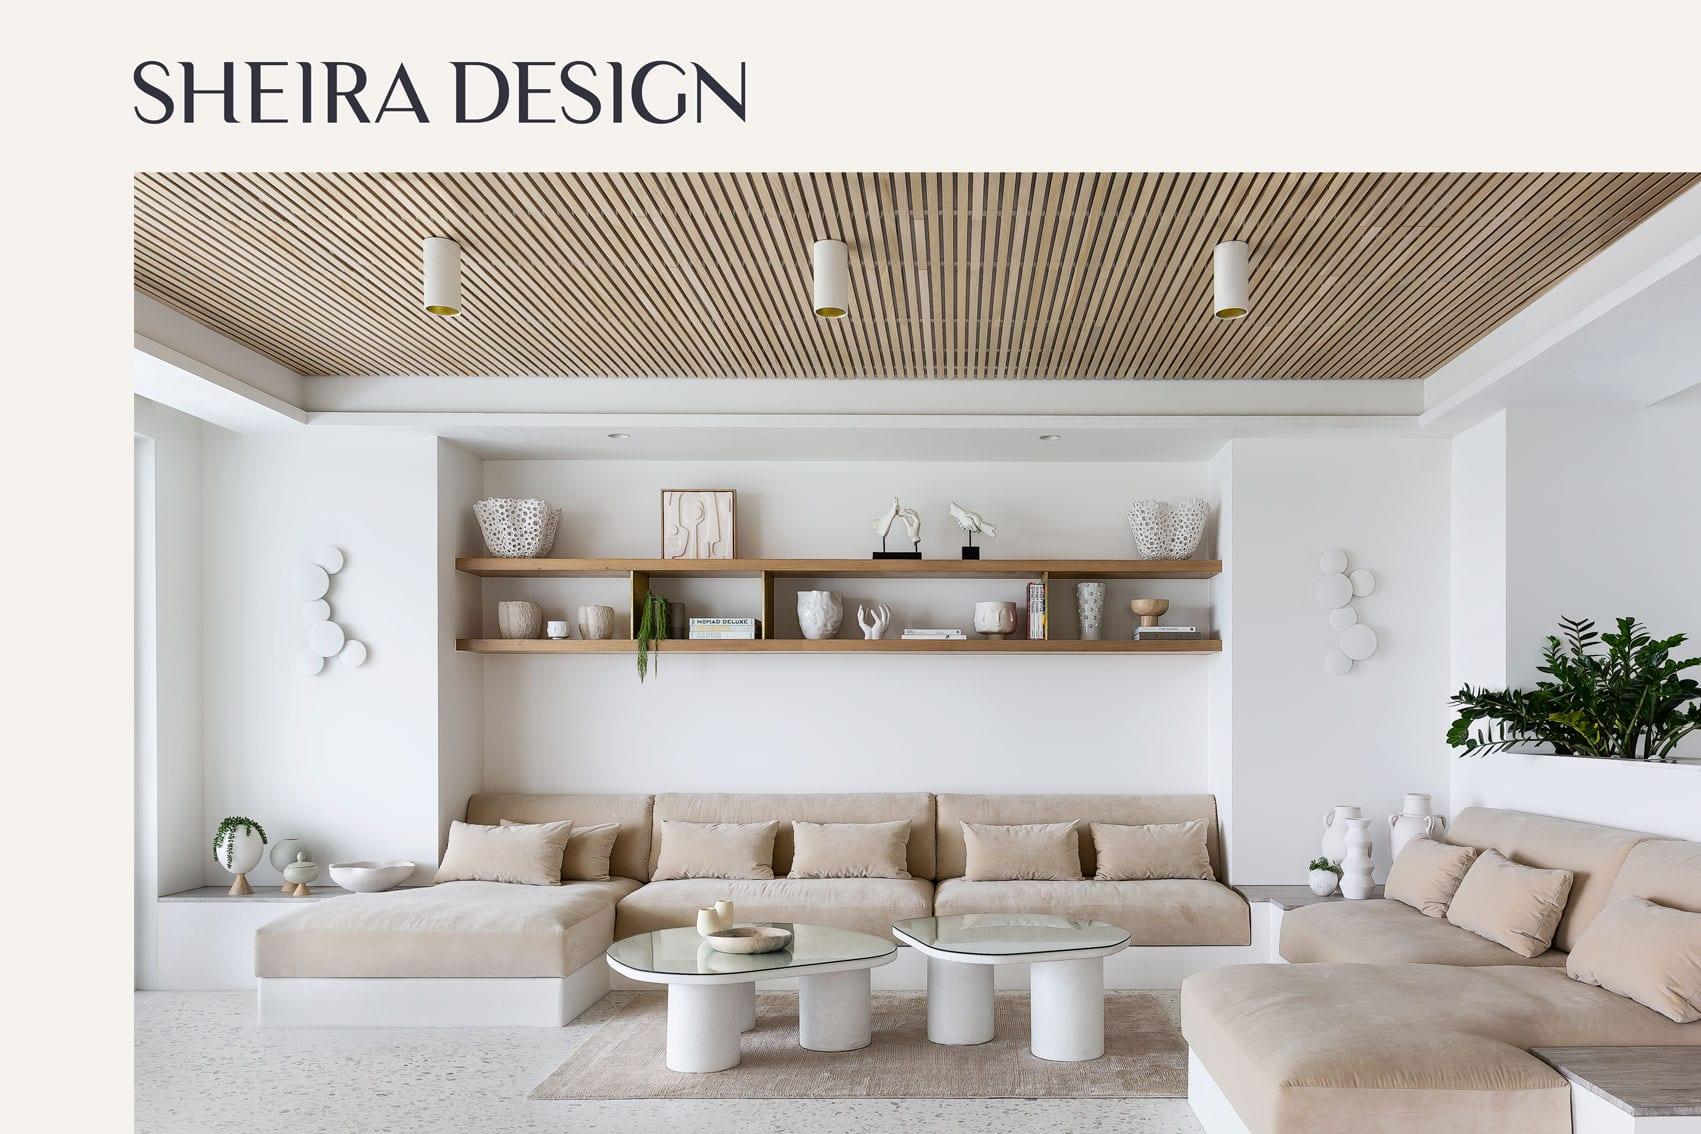 Sheira-Design-HeroImage-1